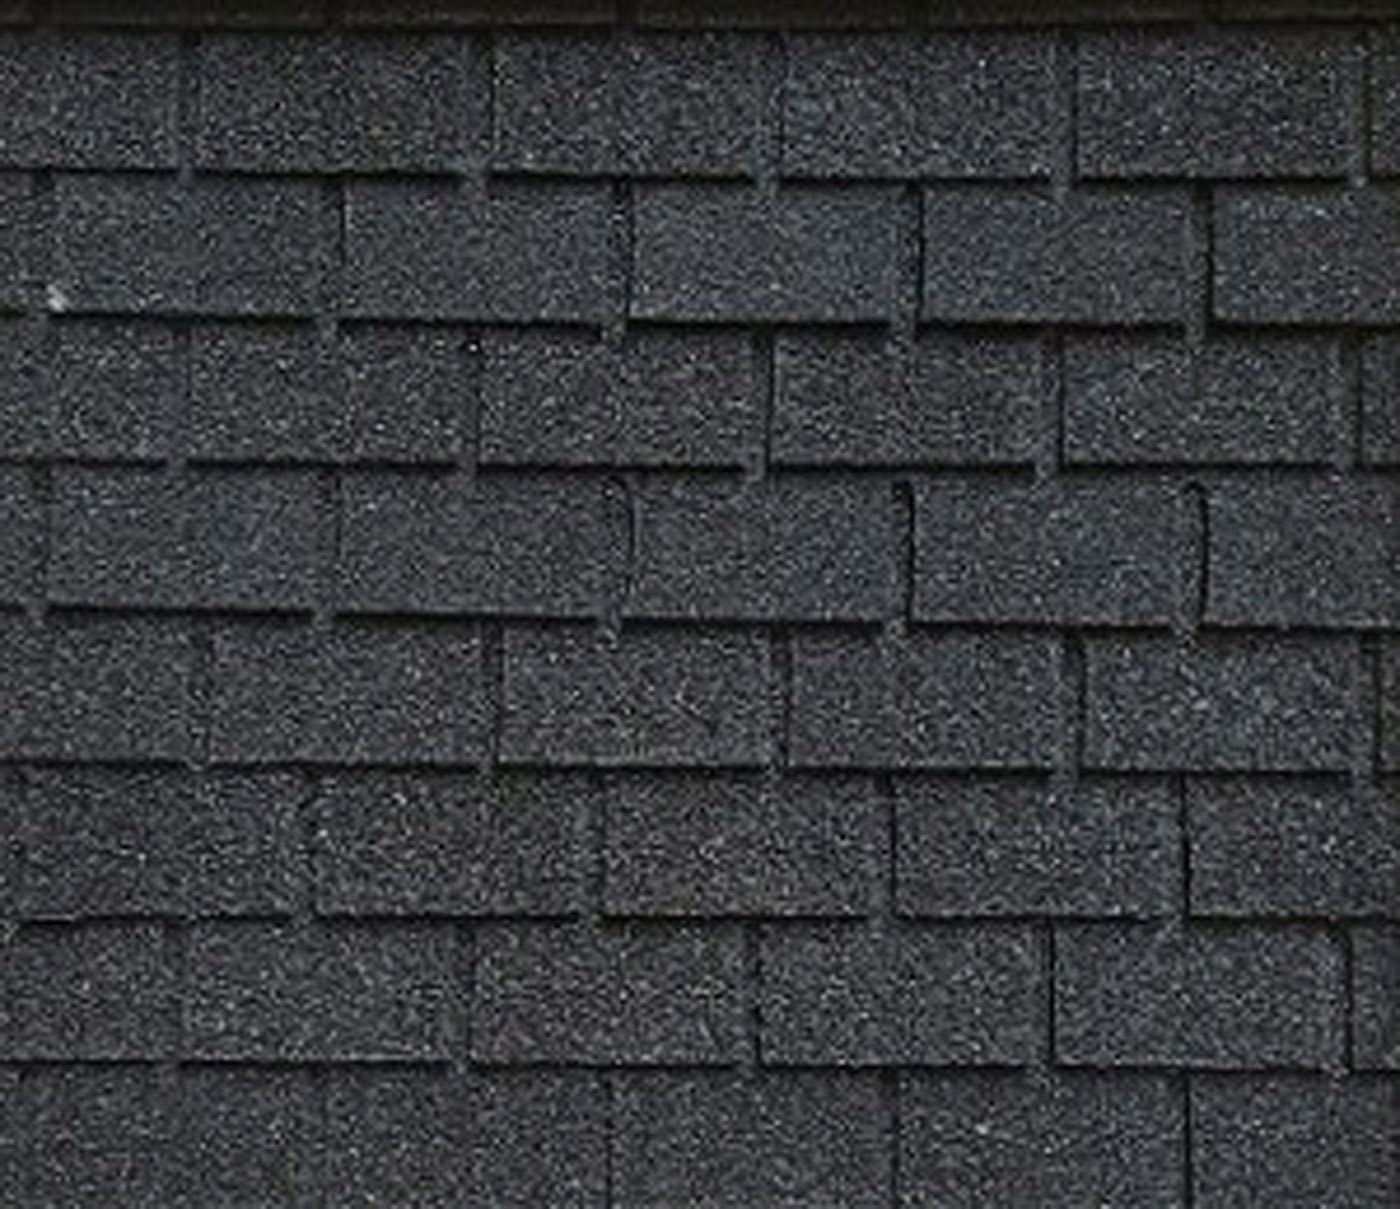 Dollhouse Miniature Roofing Black Square Asphalt Shingles